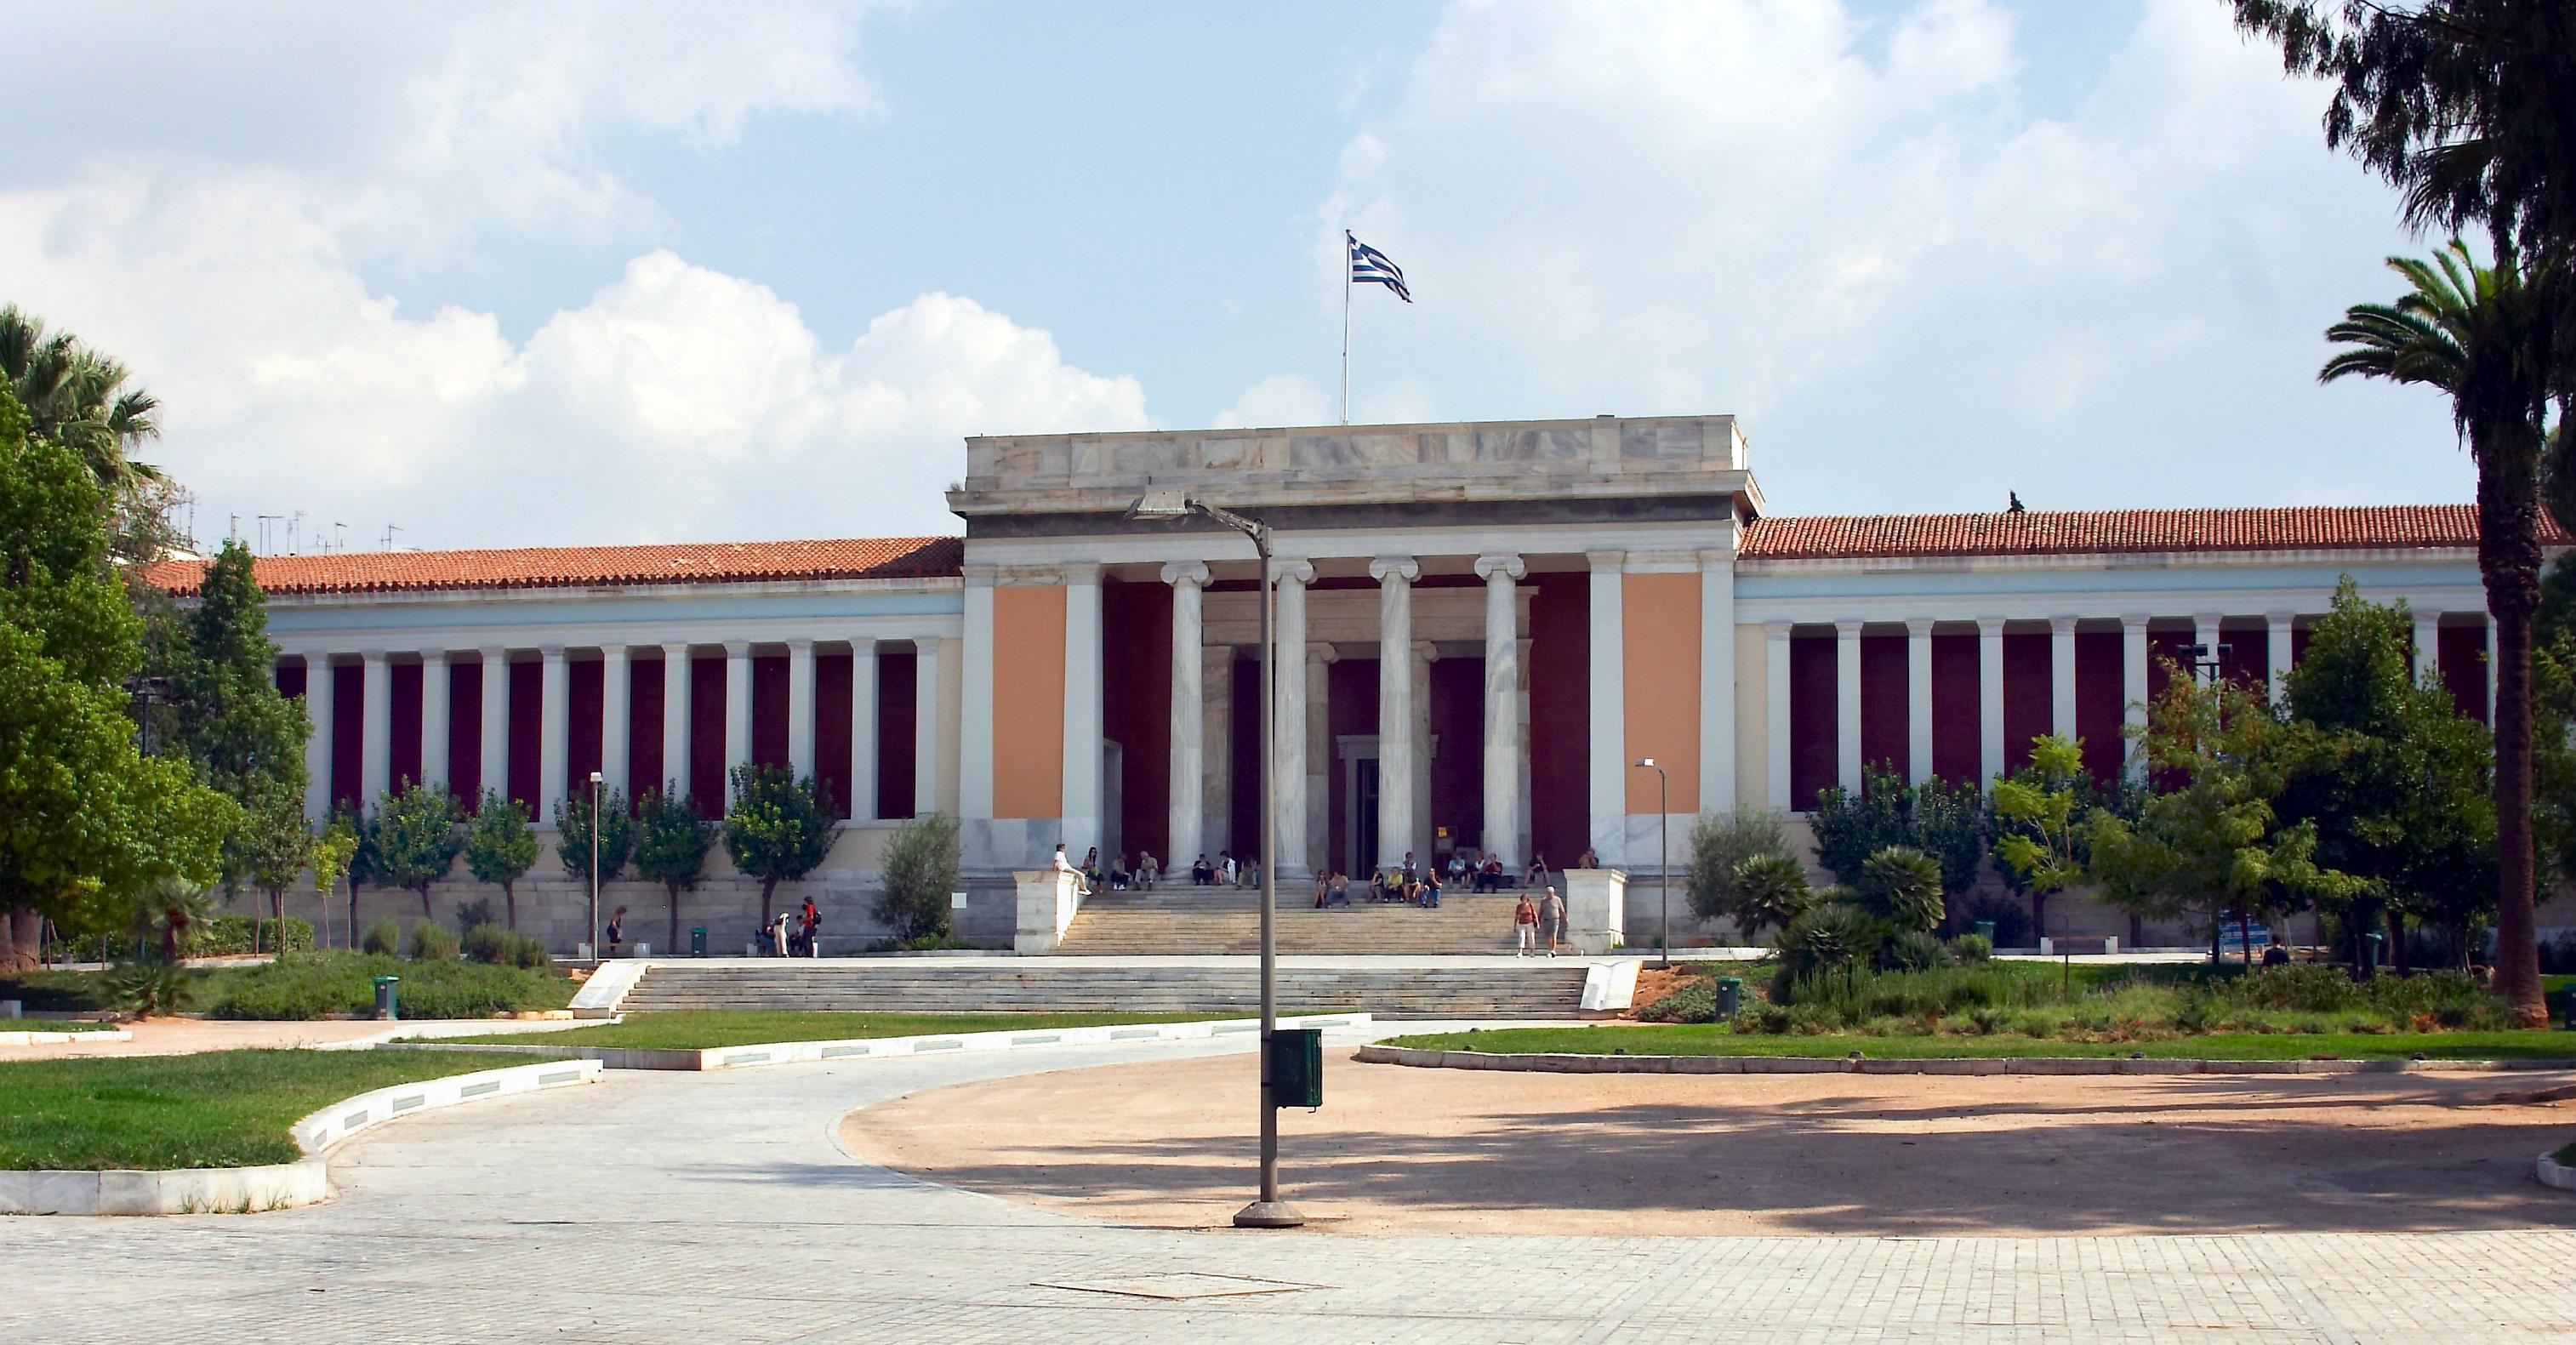 https://i1.wp.com/upload.wikimedia.org/wikipedia/commons/e/e7/Athens_-_National_Archeological_Museum_-_20060930.jpg